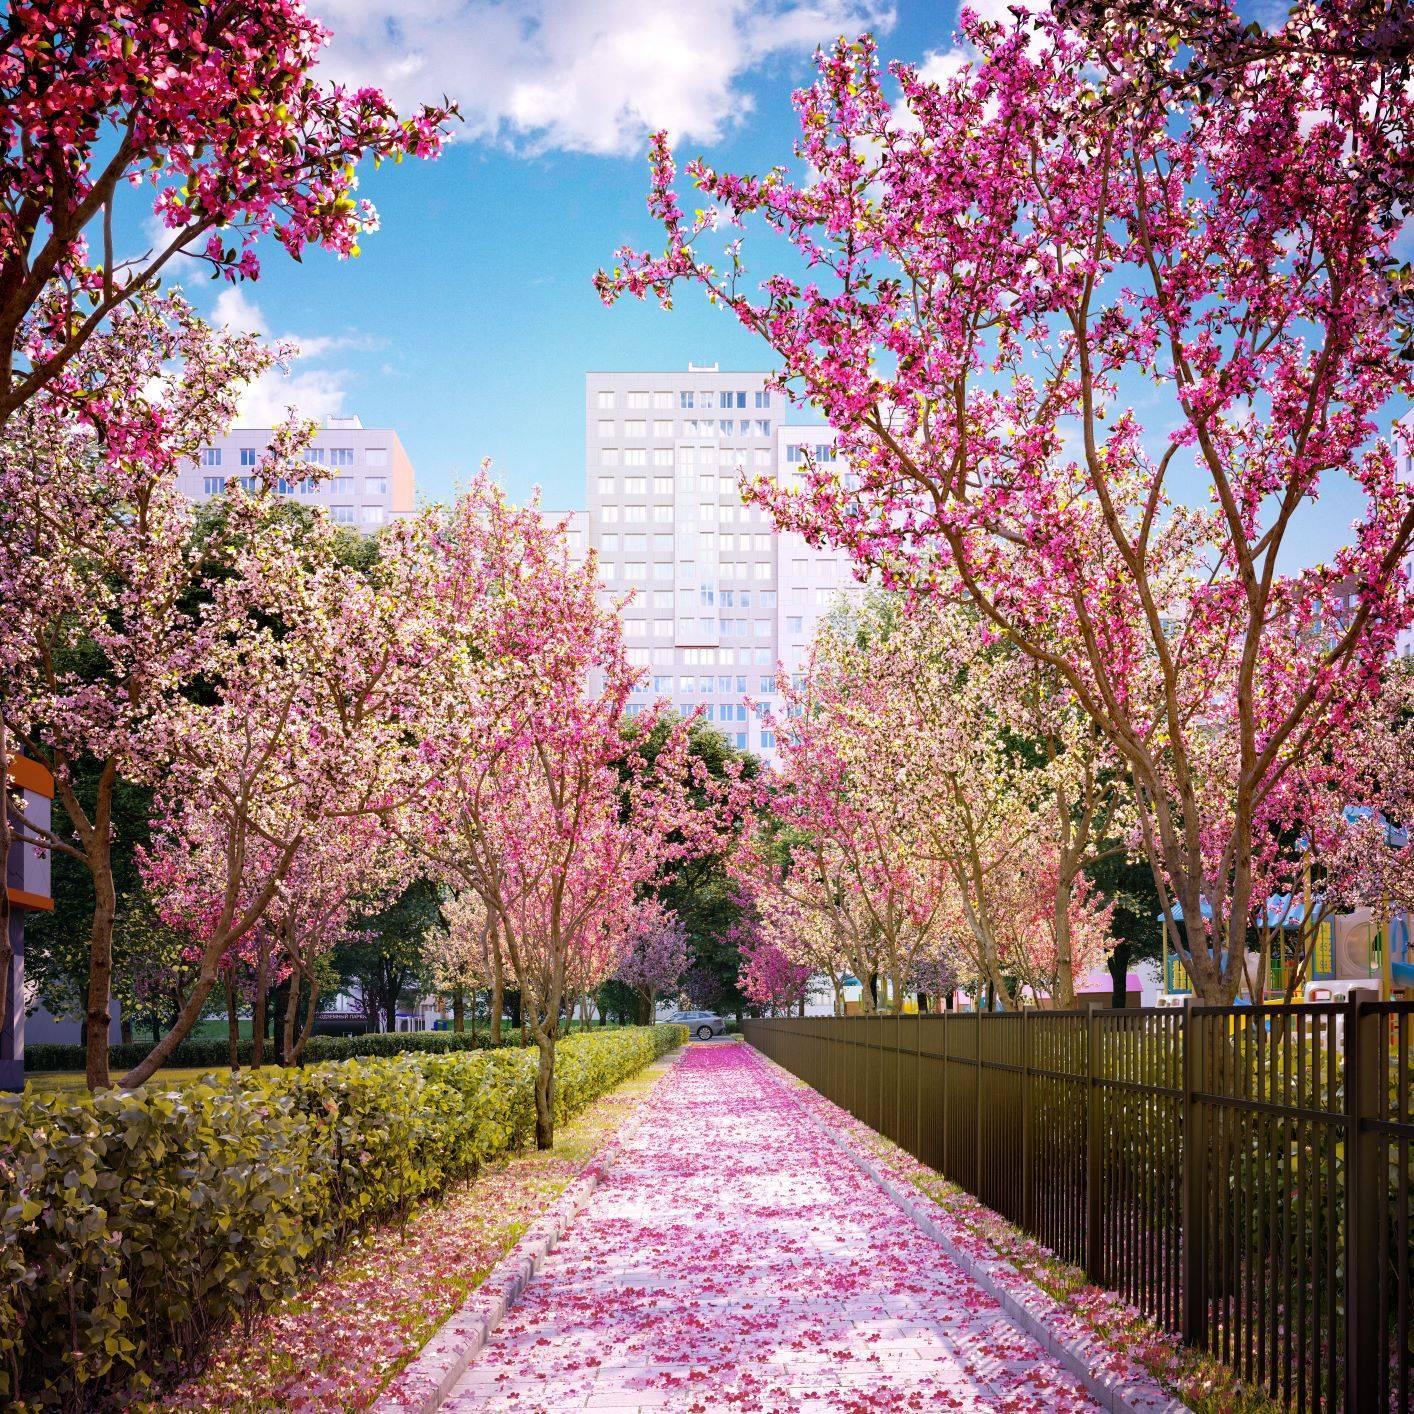 В ЖК Румянцево-Парк доступна услуга фиксации цены квартиры в режиме онлайн